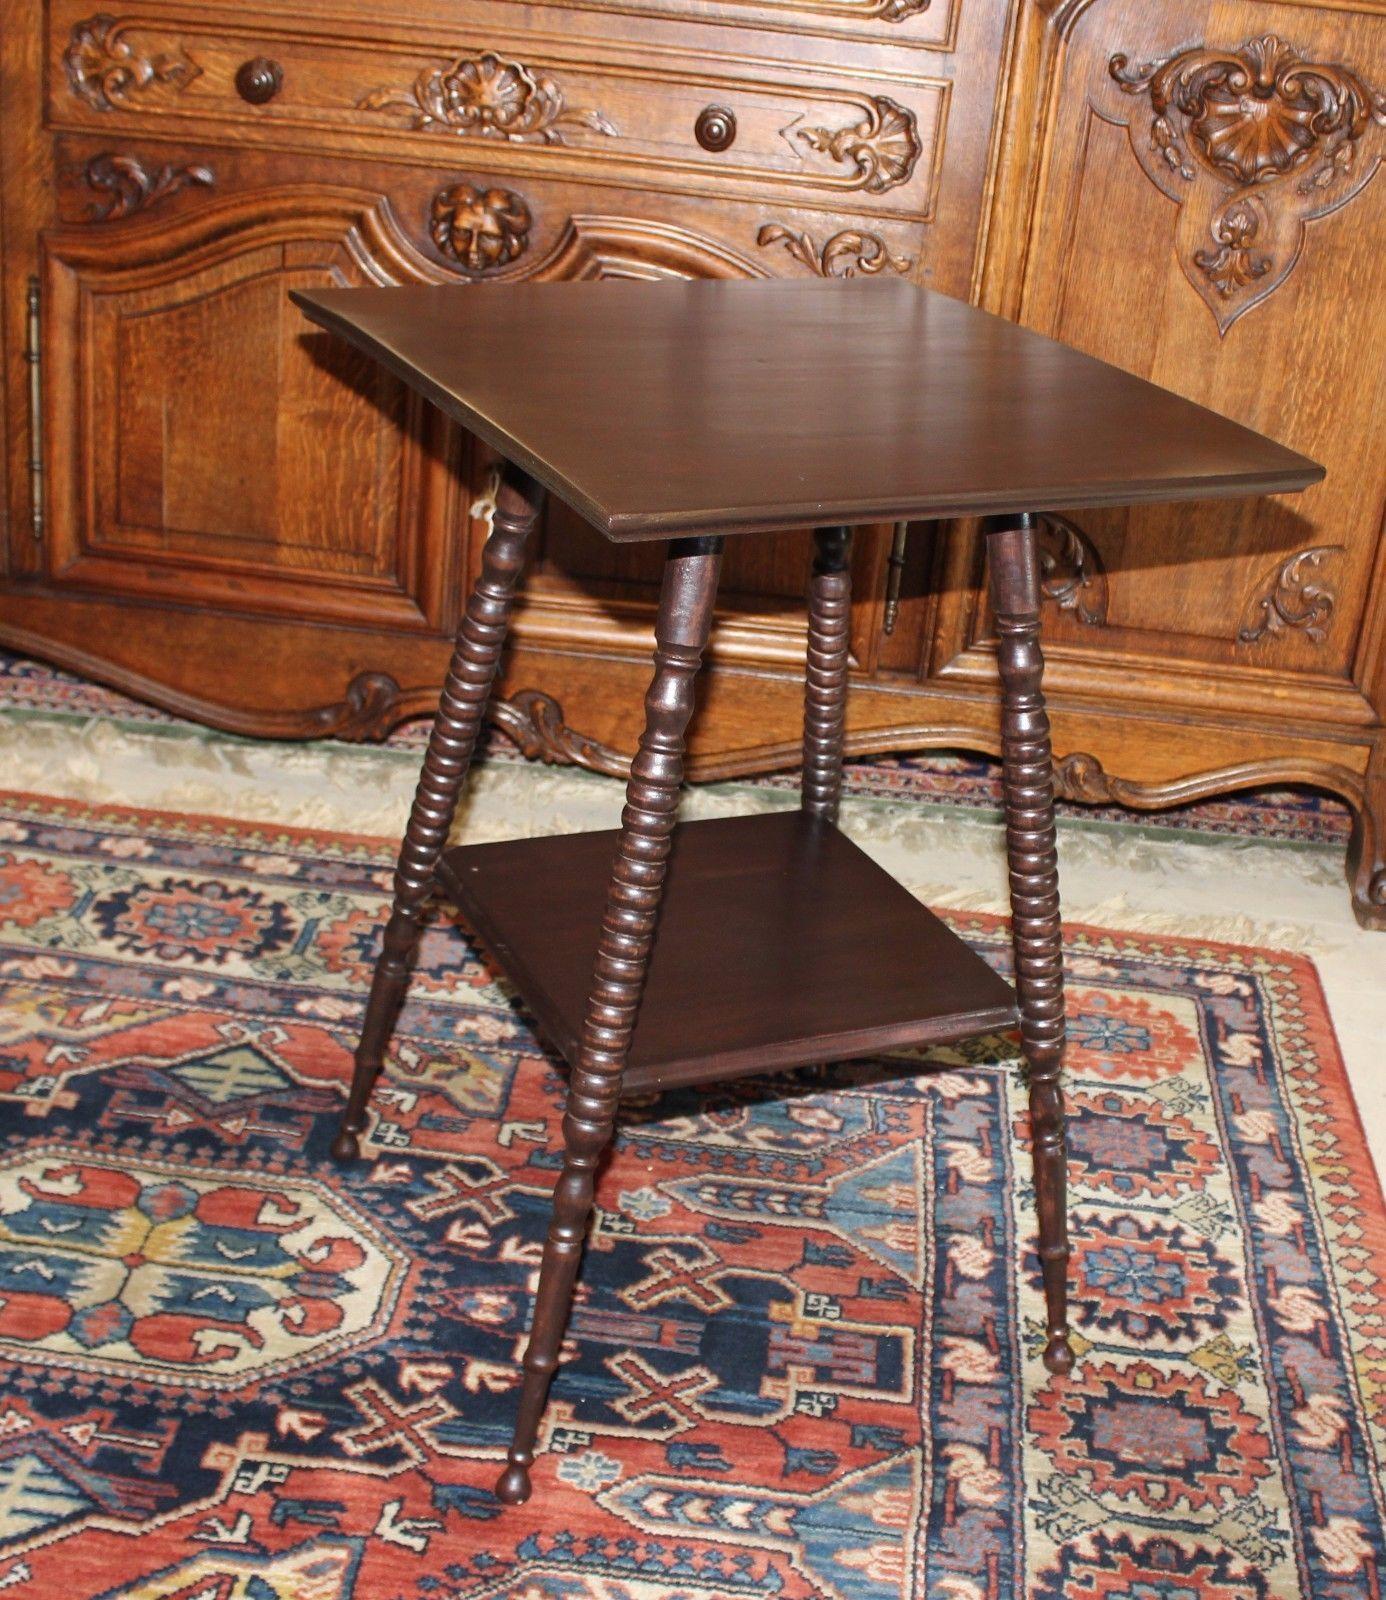 American Antique Bobbin Mahogany Side Table Small Square Table